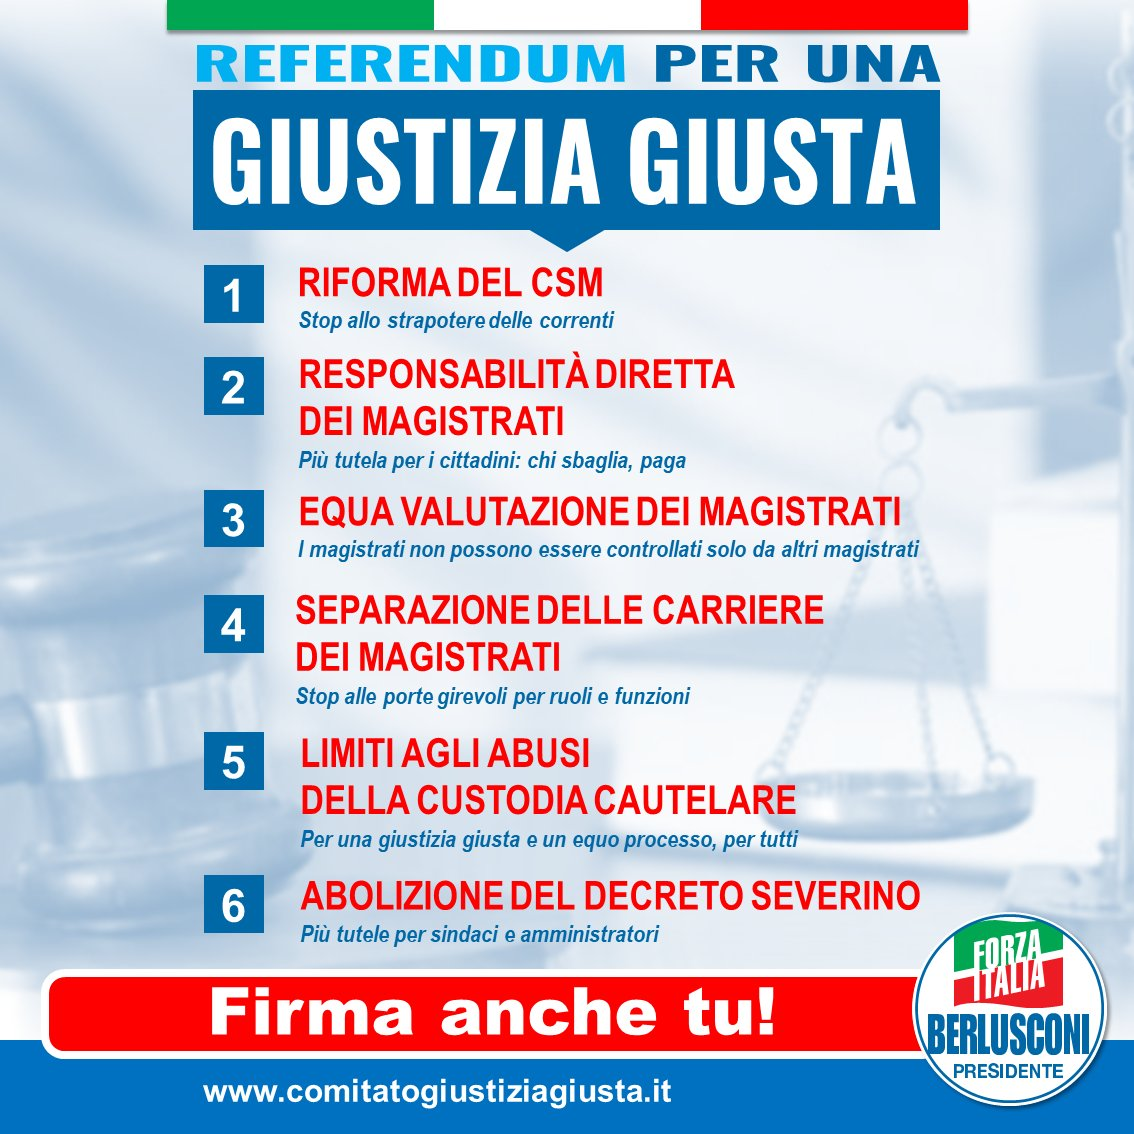 CAMPAGNA RACCOLTA FIRME REFERENDUM GIUSTIZIA, SI PARTE!